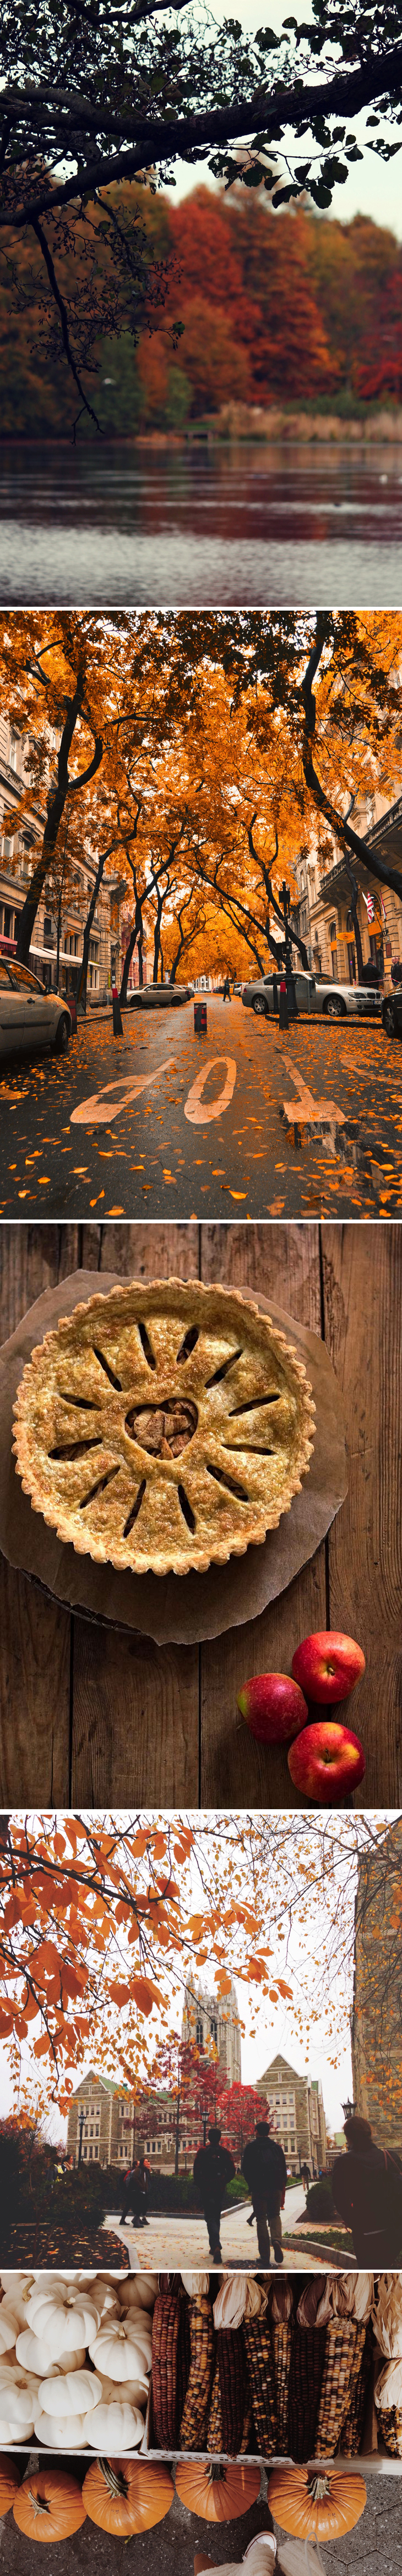 autumn fall guide inspiration cosy fall pumpkin pie